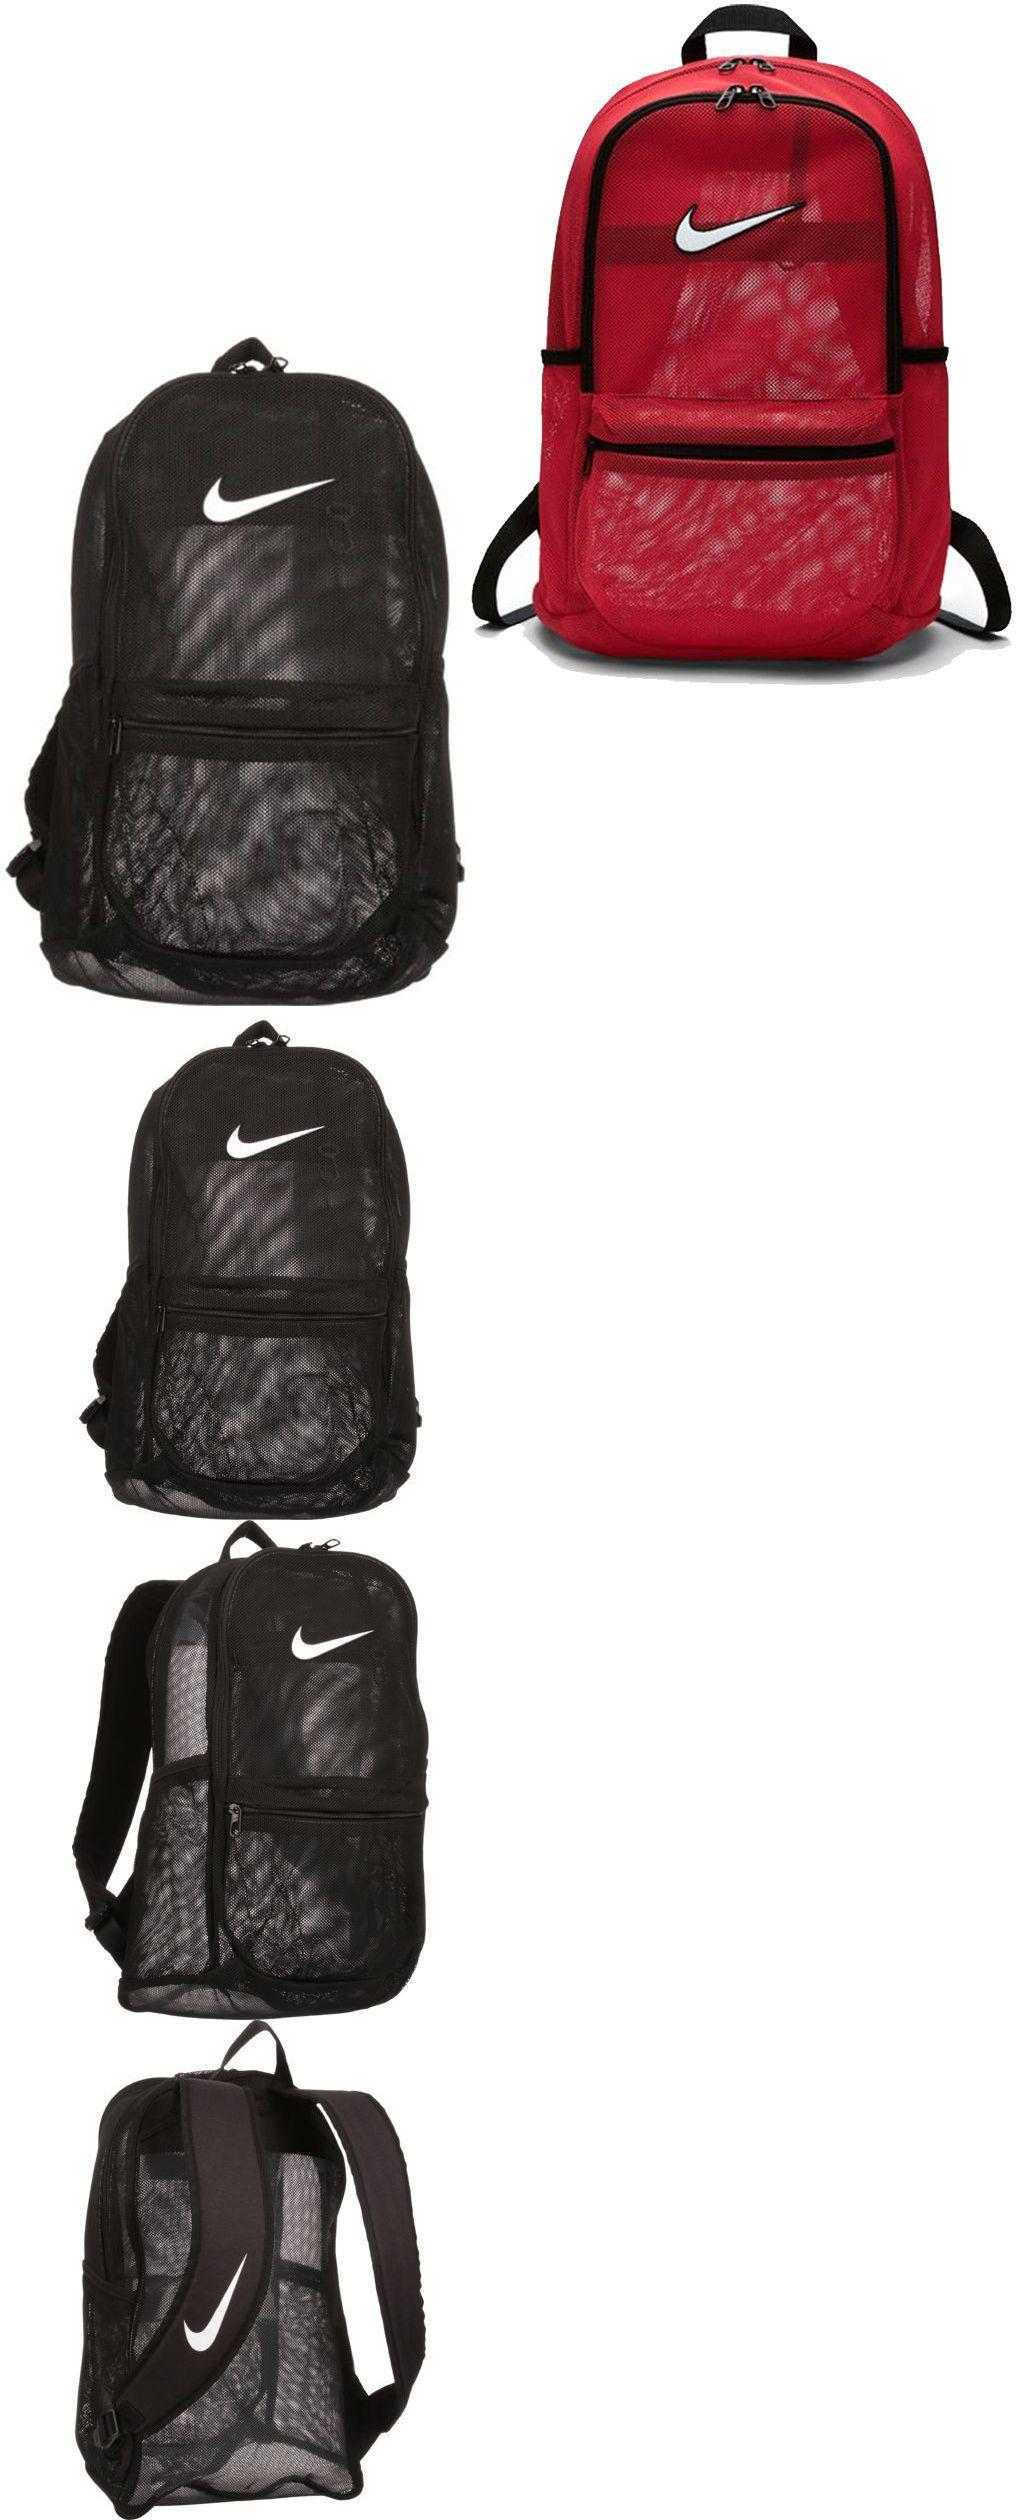 6b8556519e46 free shipping 99+ at jcpenney nike brasilia mesh backpack meet 16834 ...